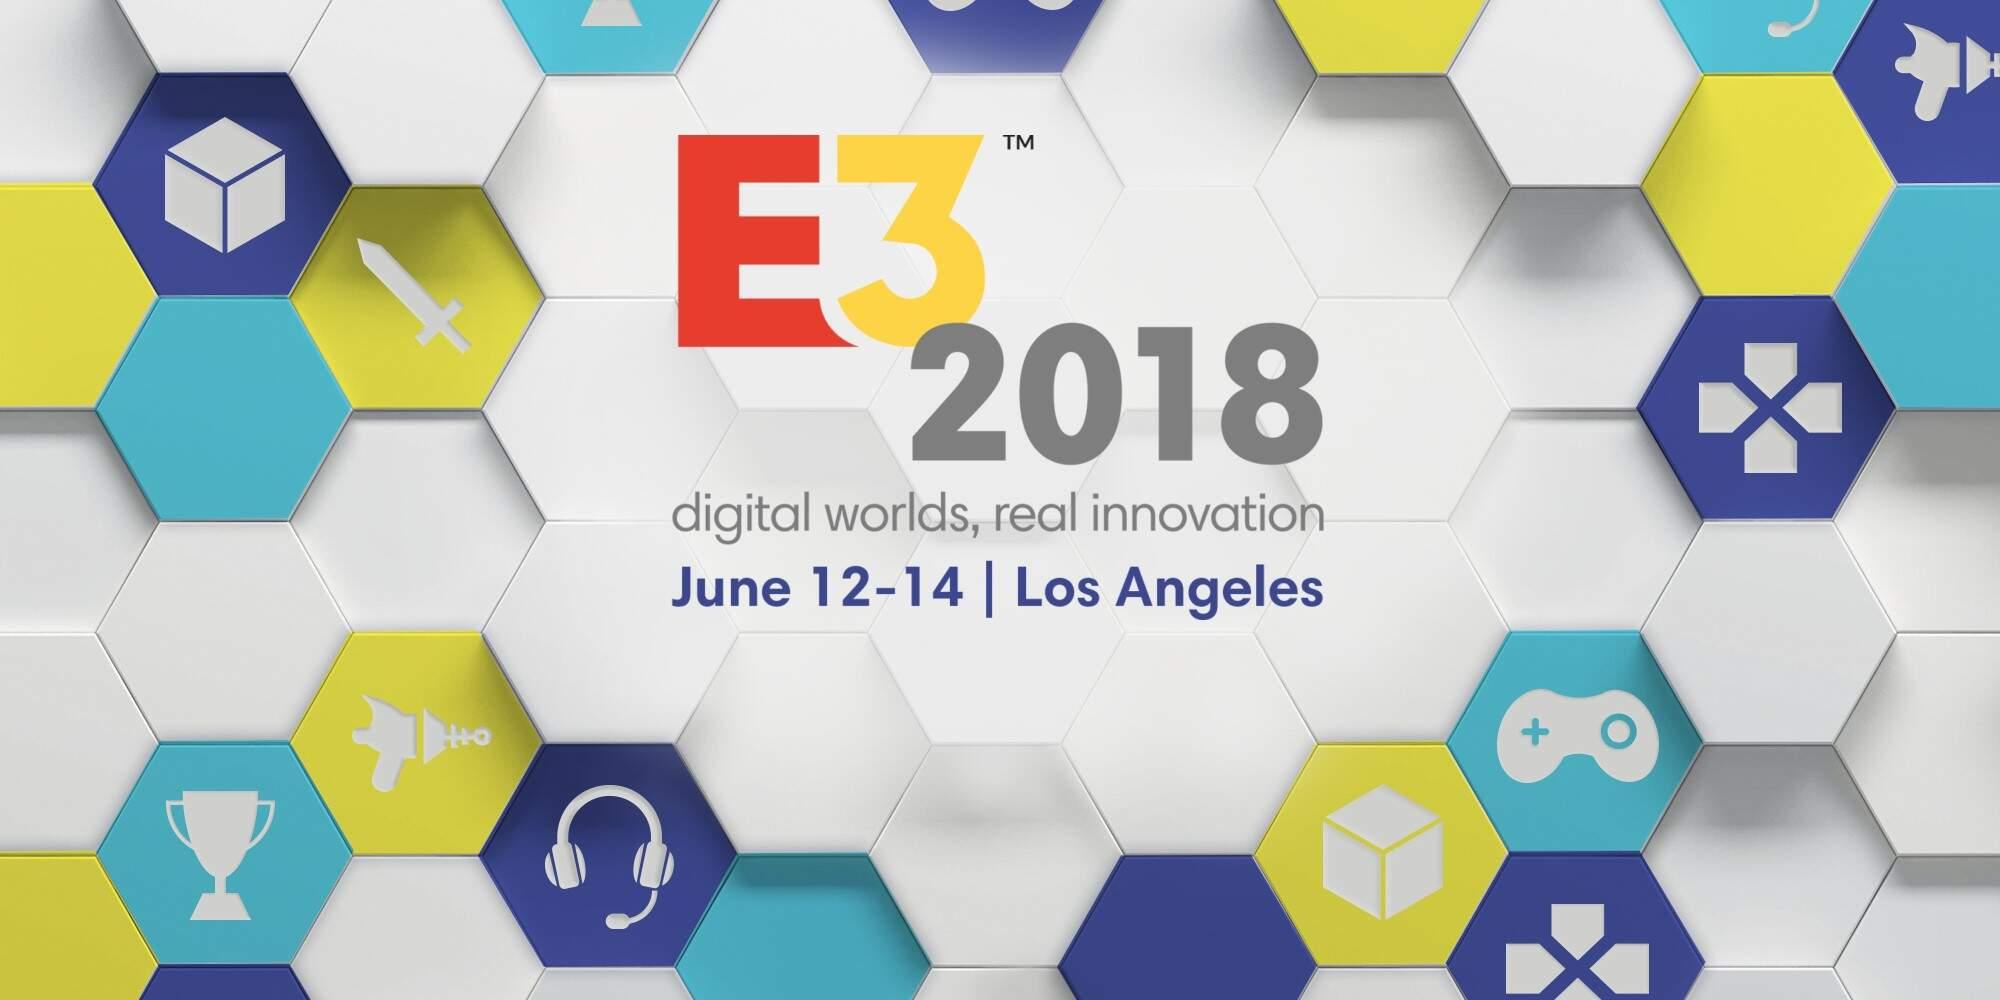 E3 2018 Visual